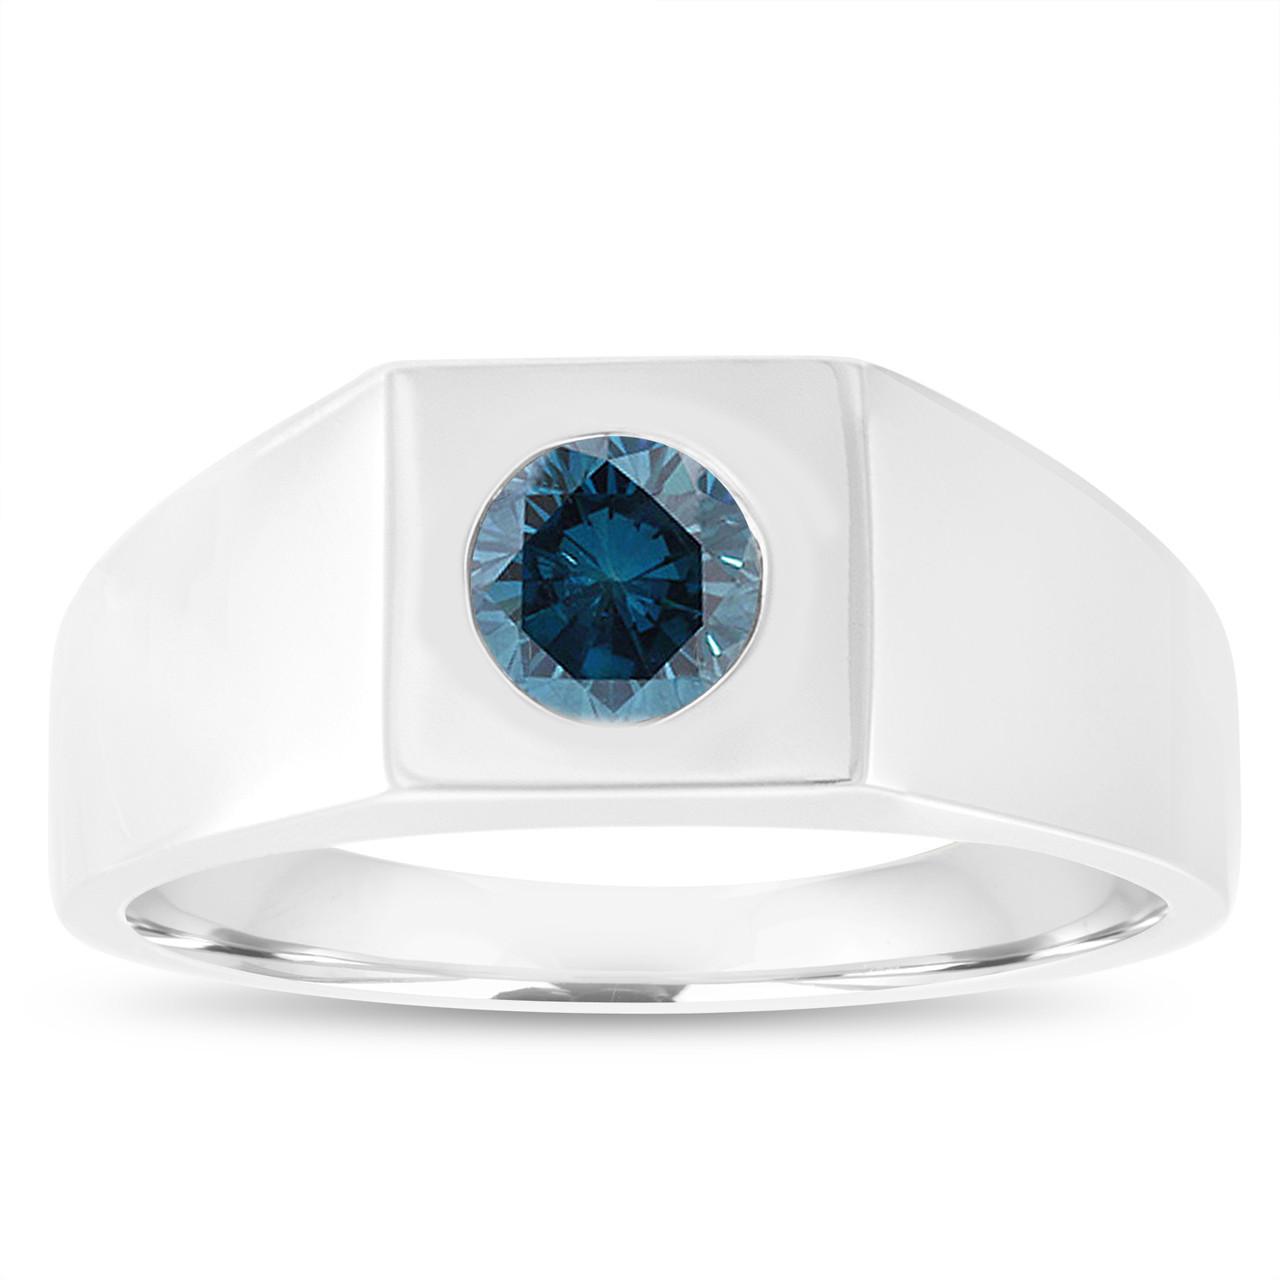 0f3a2bcd188d0 Men's Blue Diamond Solitaire Engagement Ring, Mens Wedding Ring 14K White  Gold 0.90 Carat Handmade